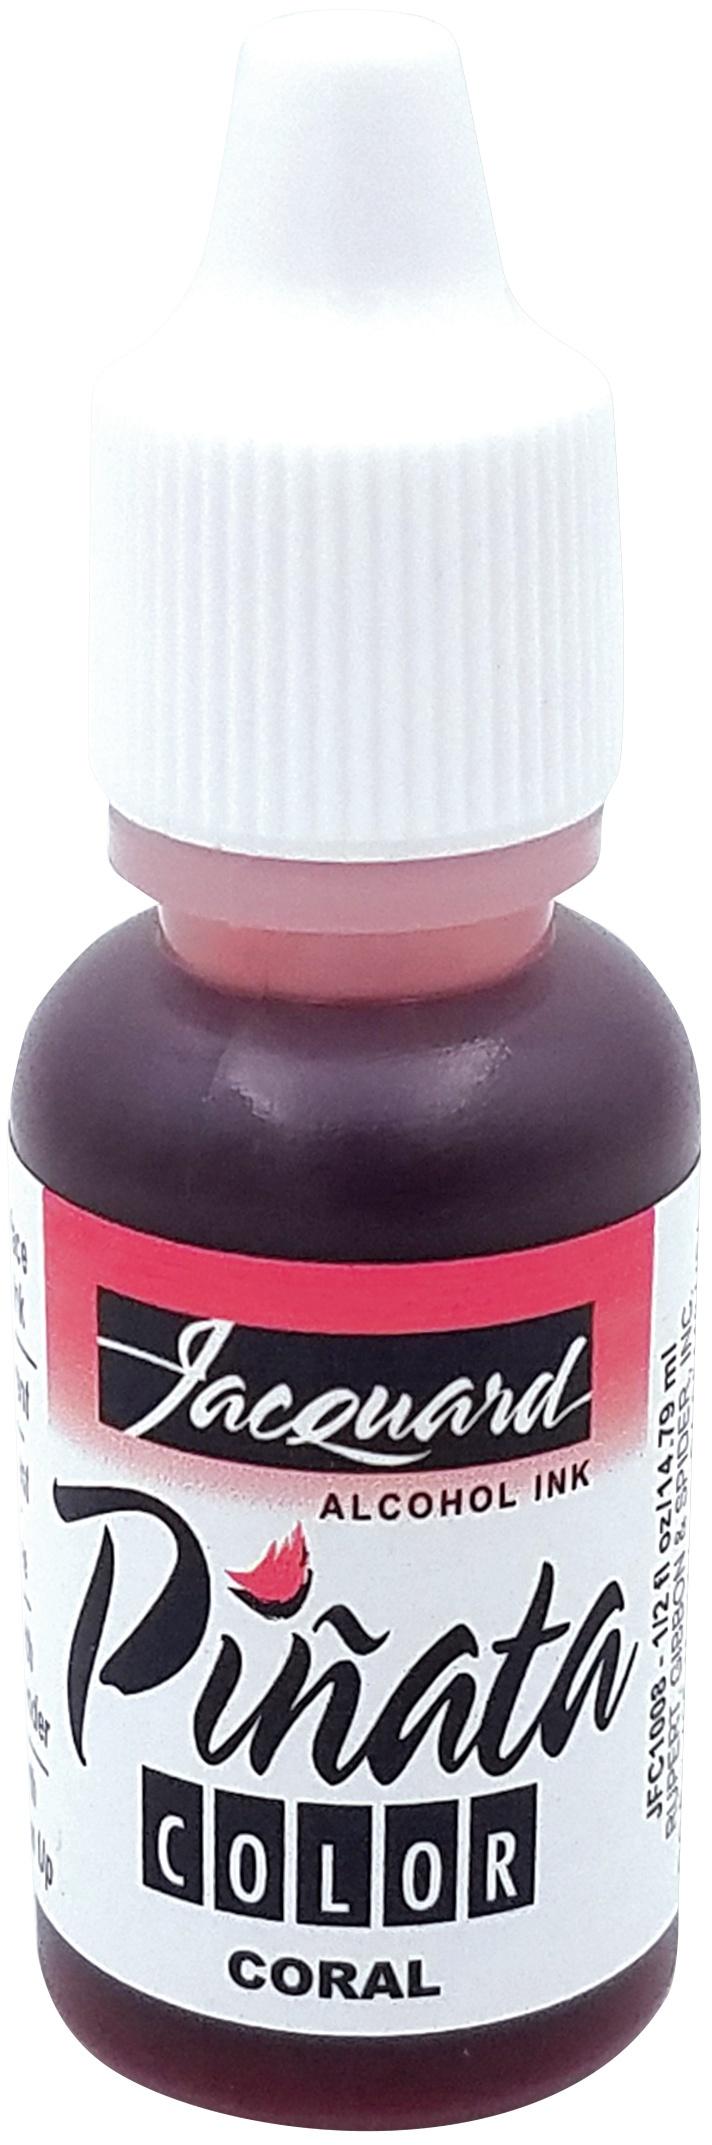 Jacquard Pinata Color Alcohol Ink .5oz-Coral